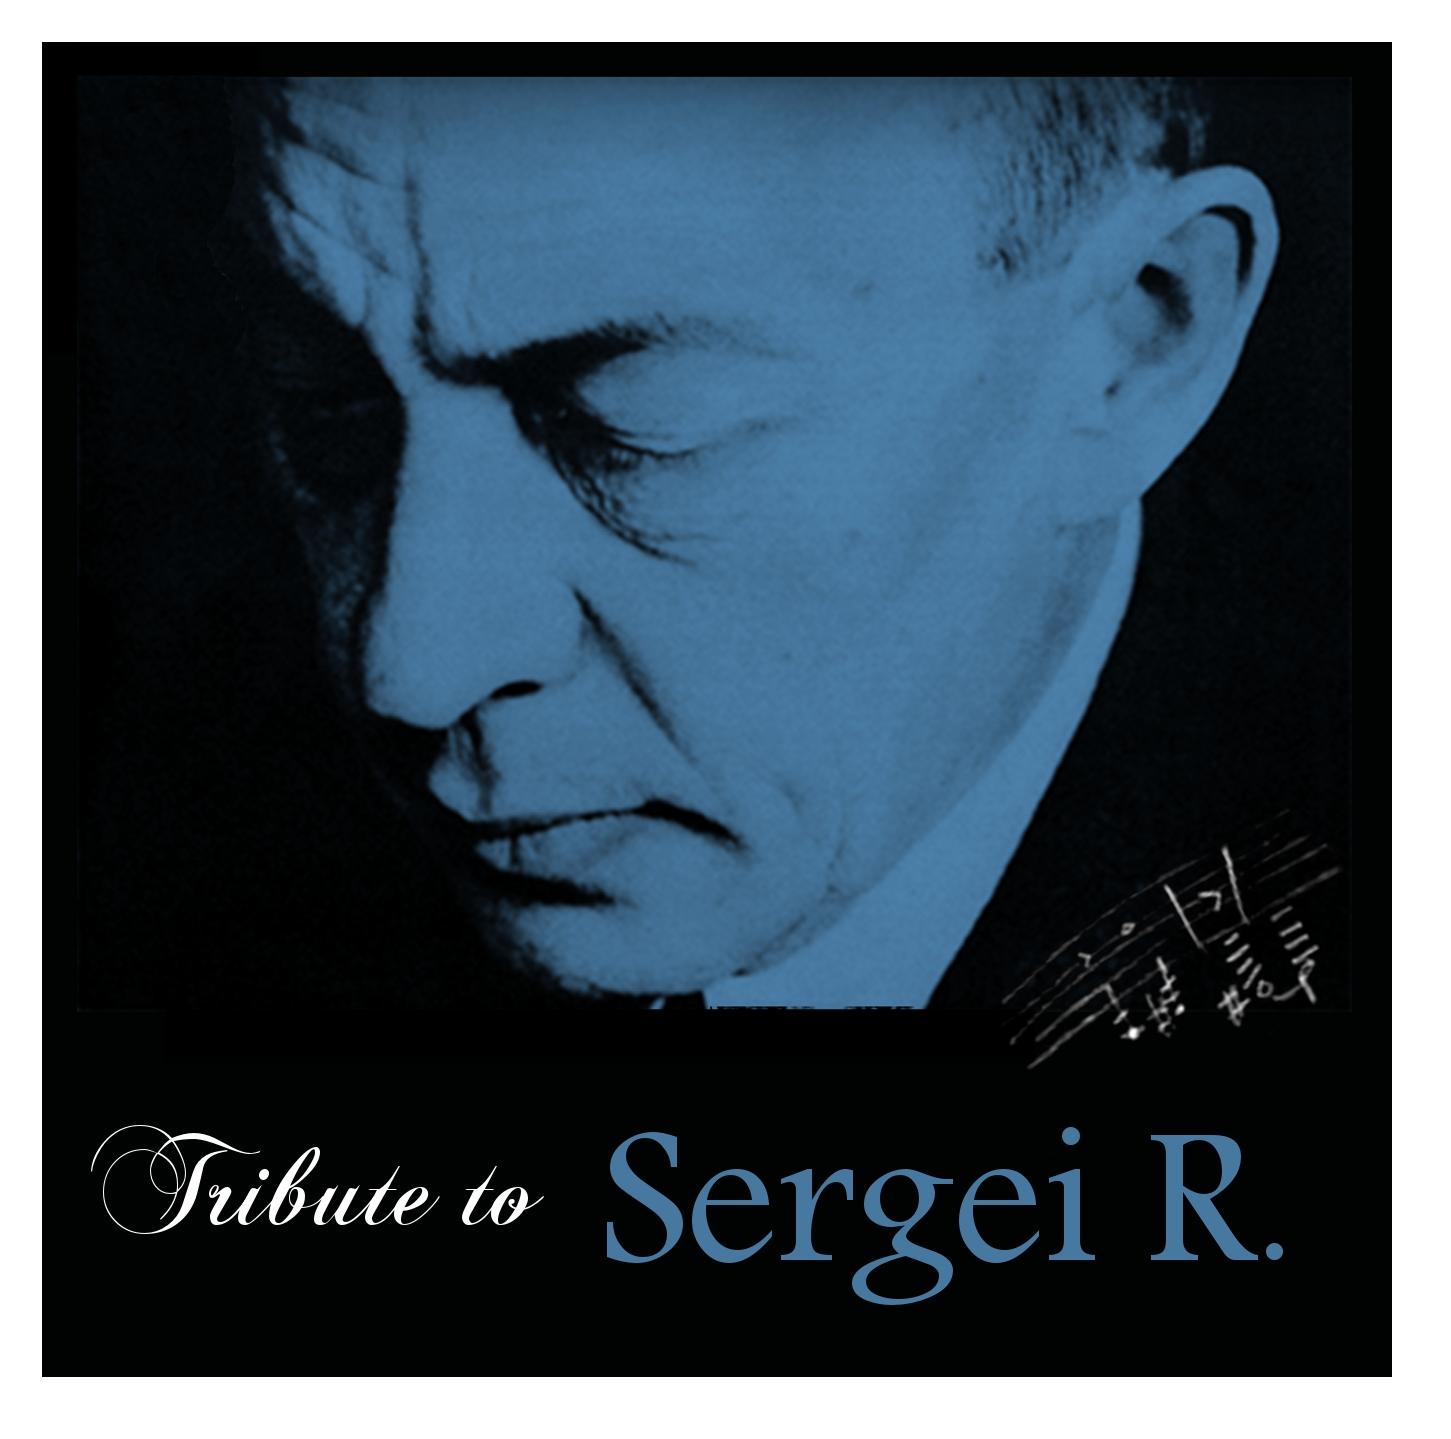 Tribute to Sergei R.